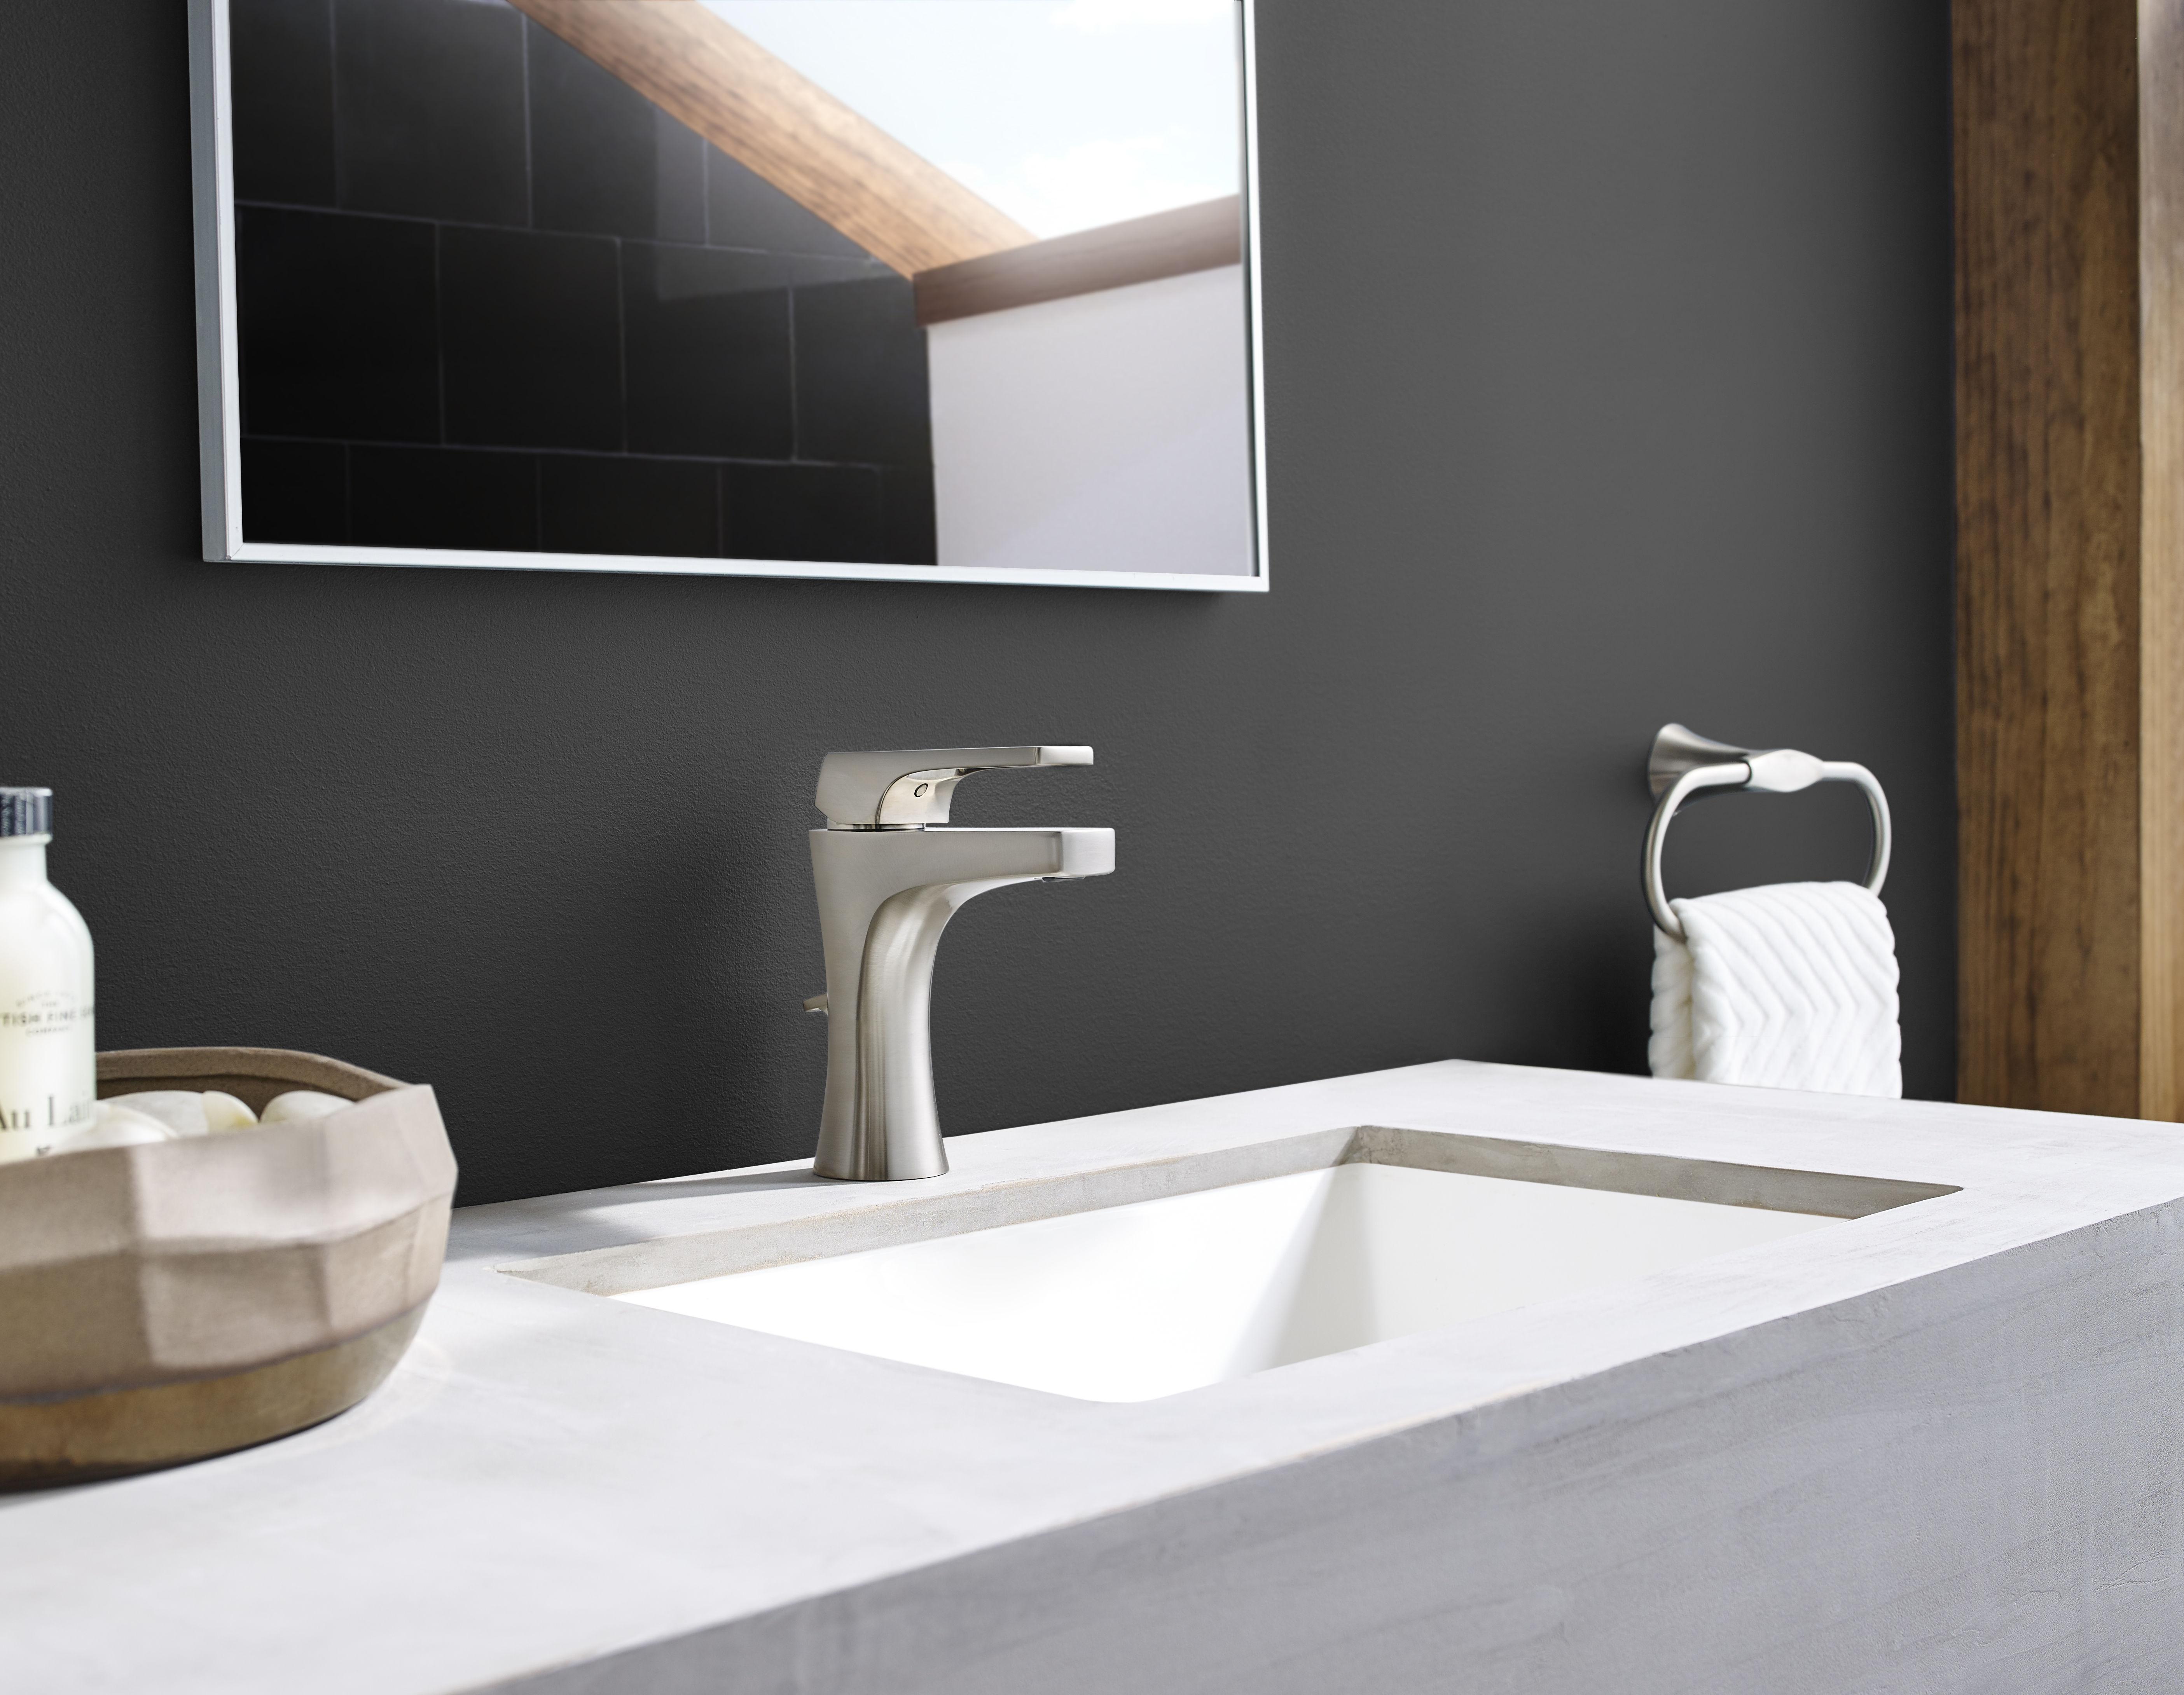 Pfister LG42-MF0K Brushed Nickel Kelen Single Hole Bathroom Faucet ...